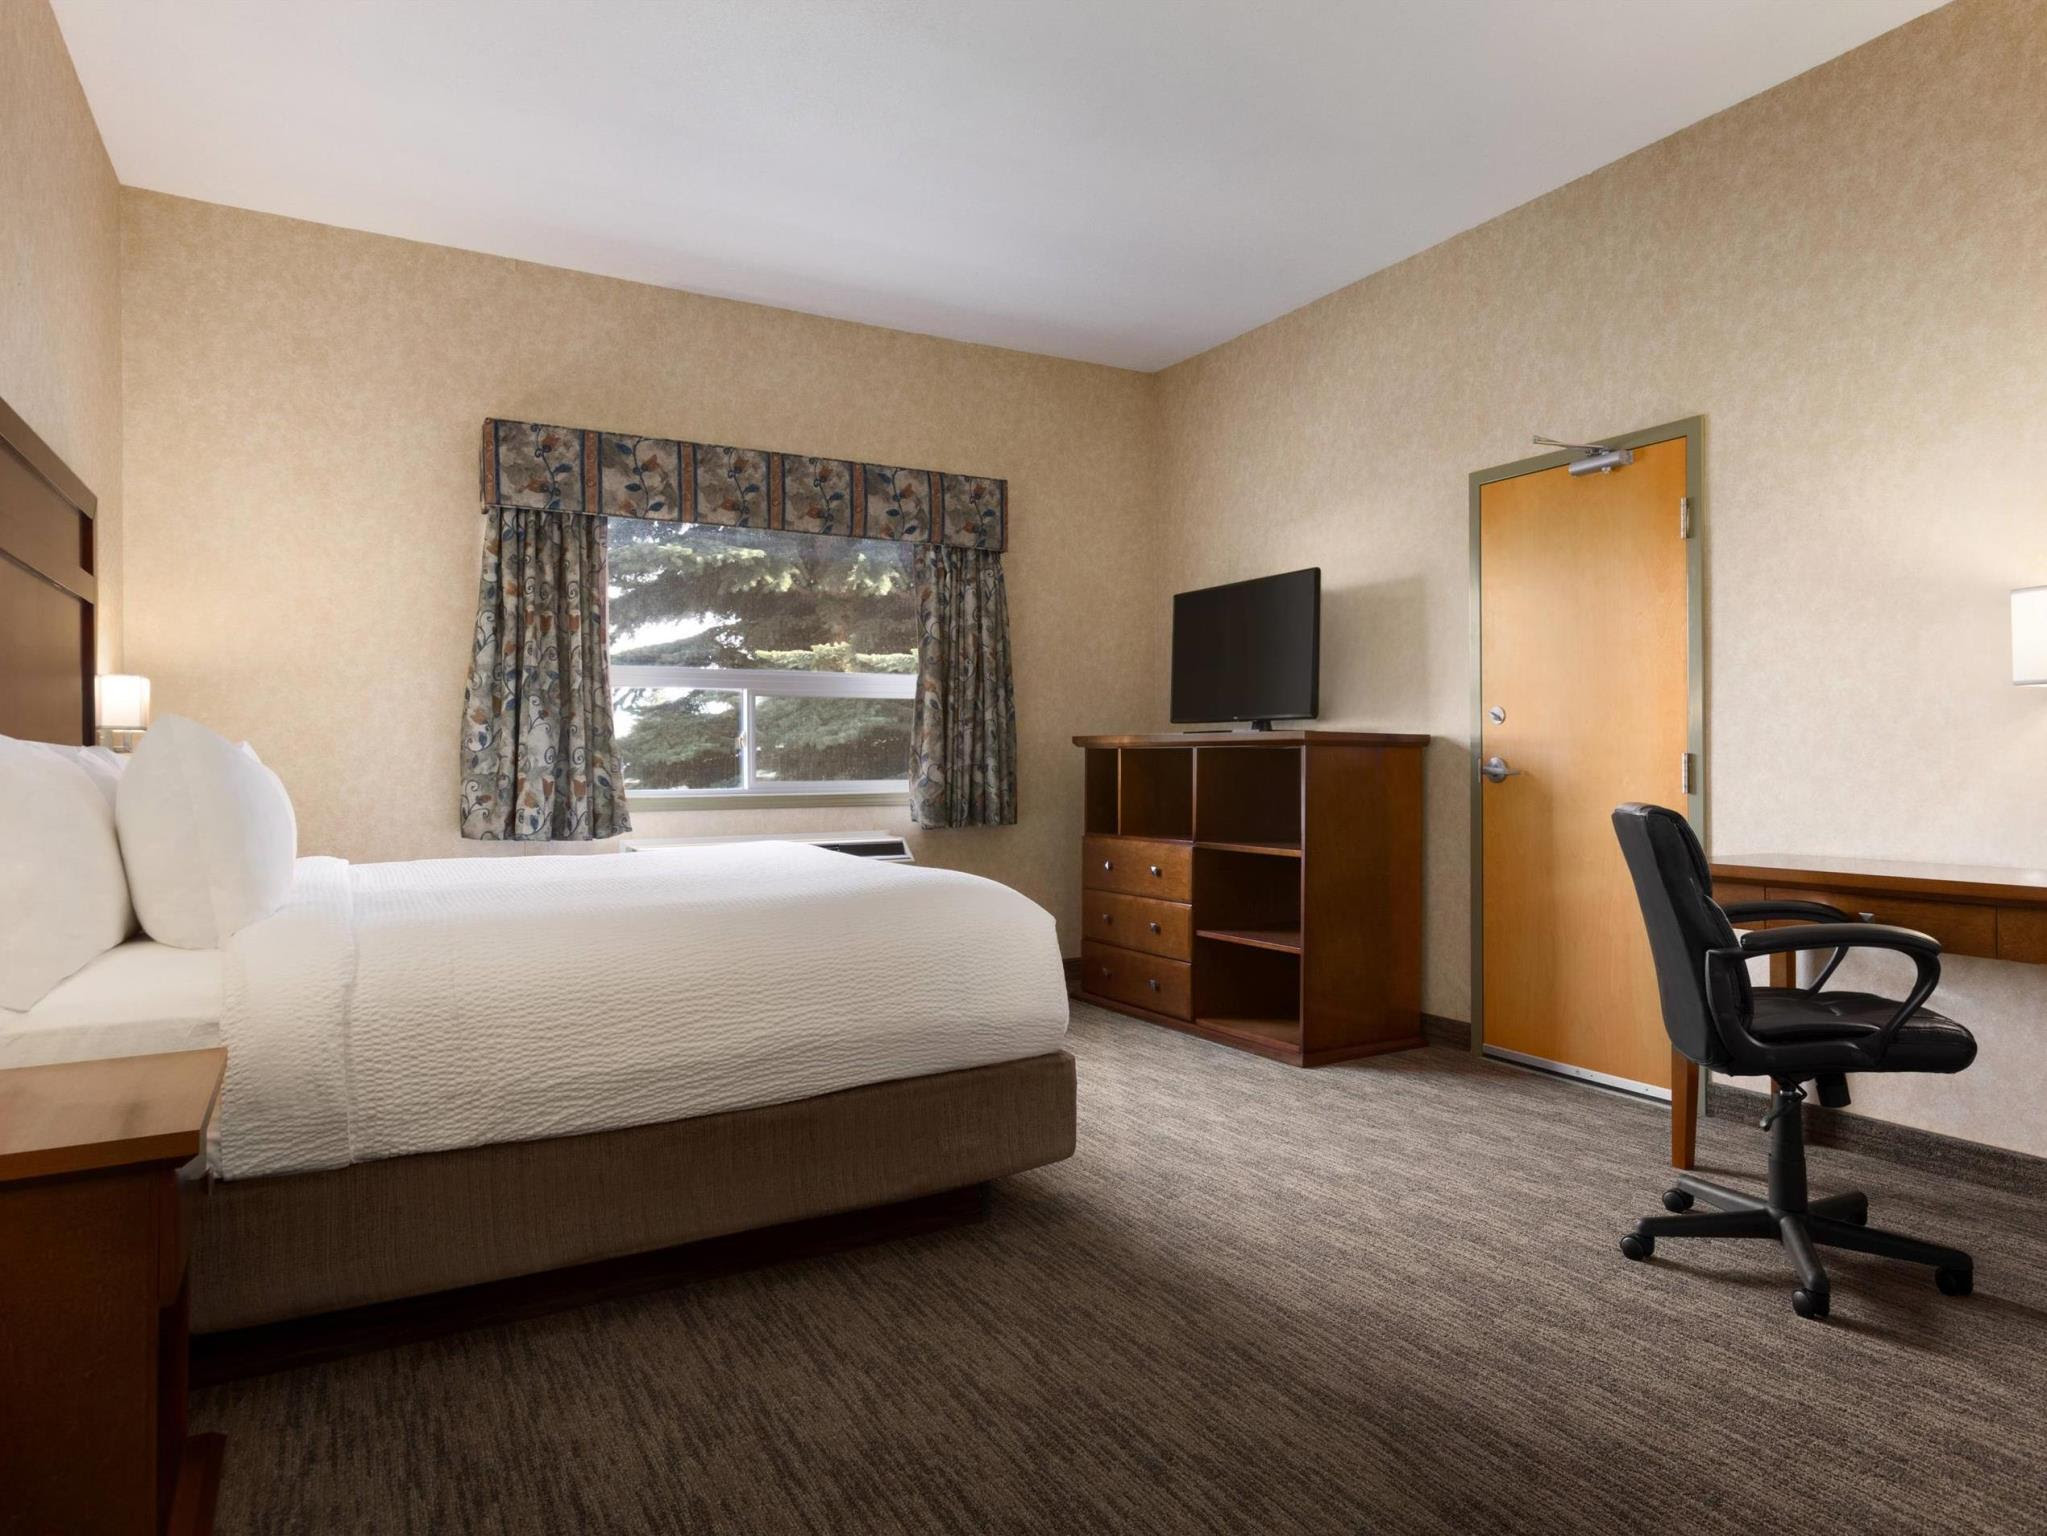 Days Inn & Suites by Wyndham Brooks Discount